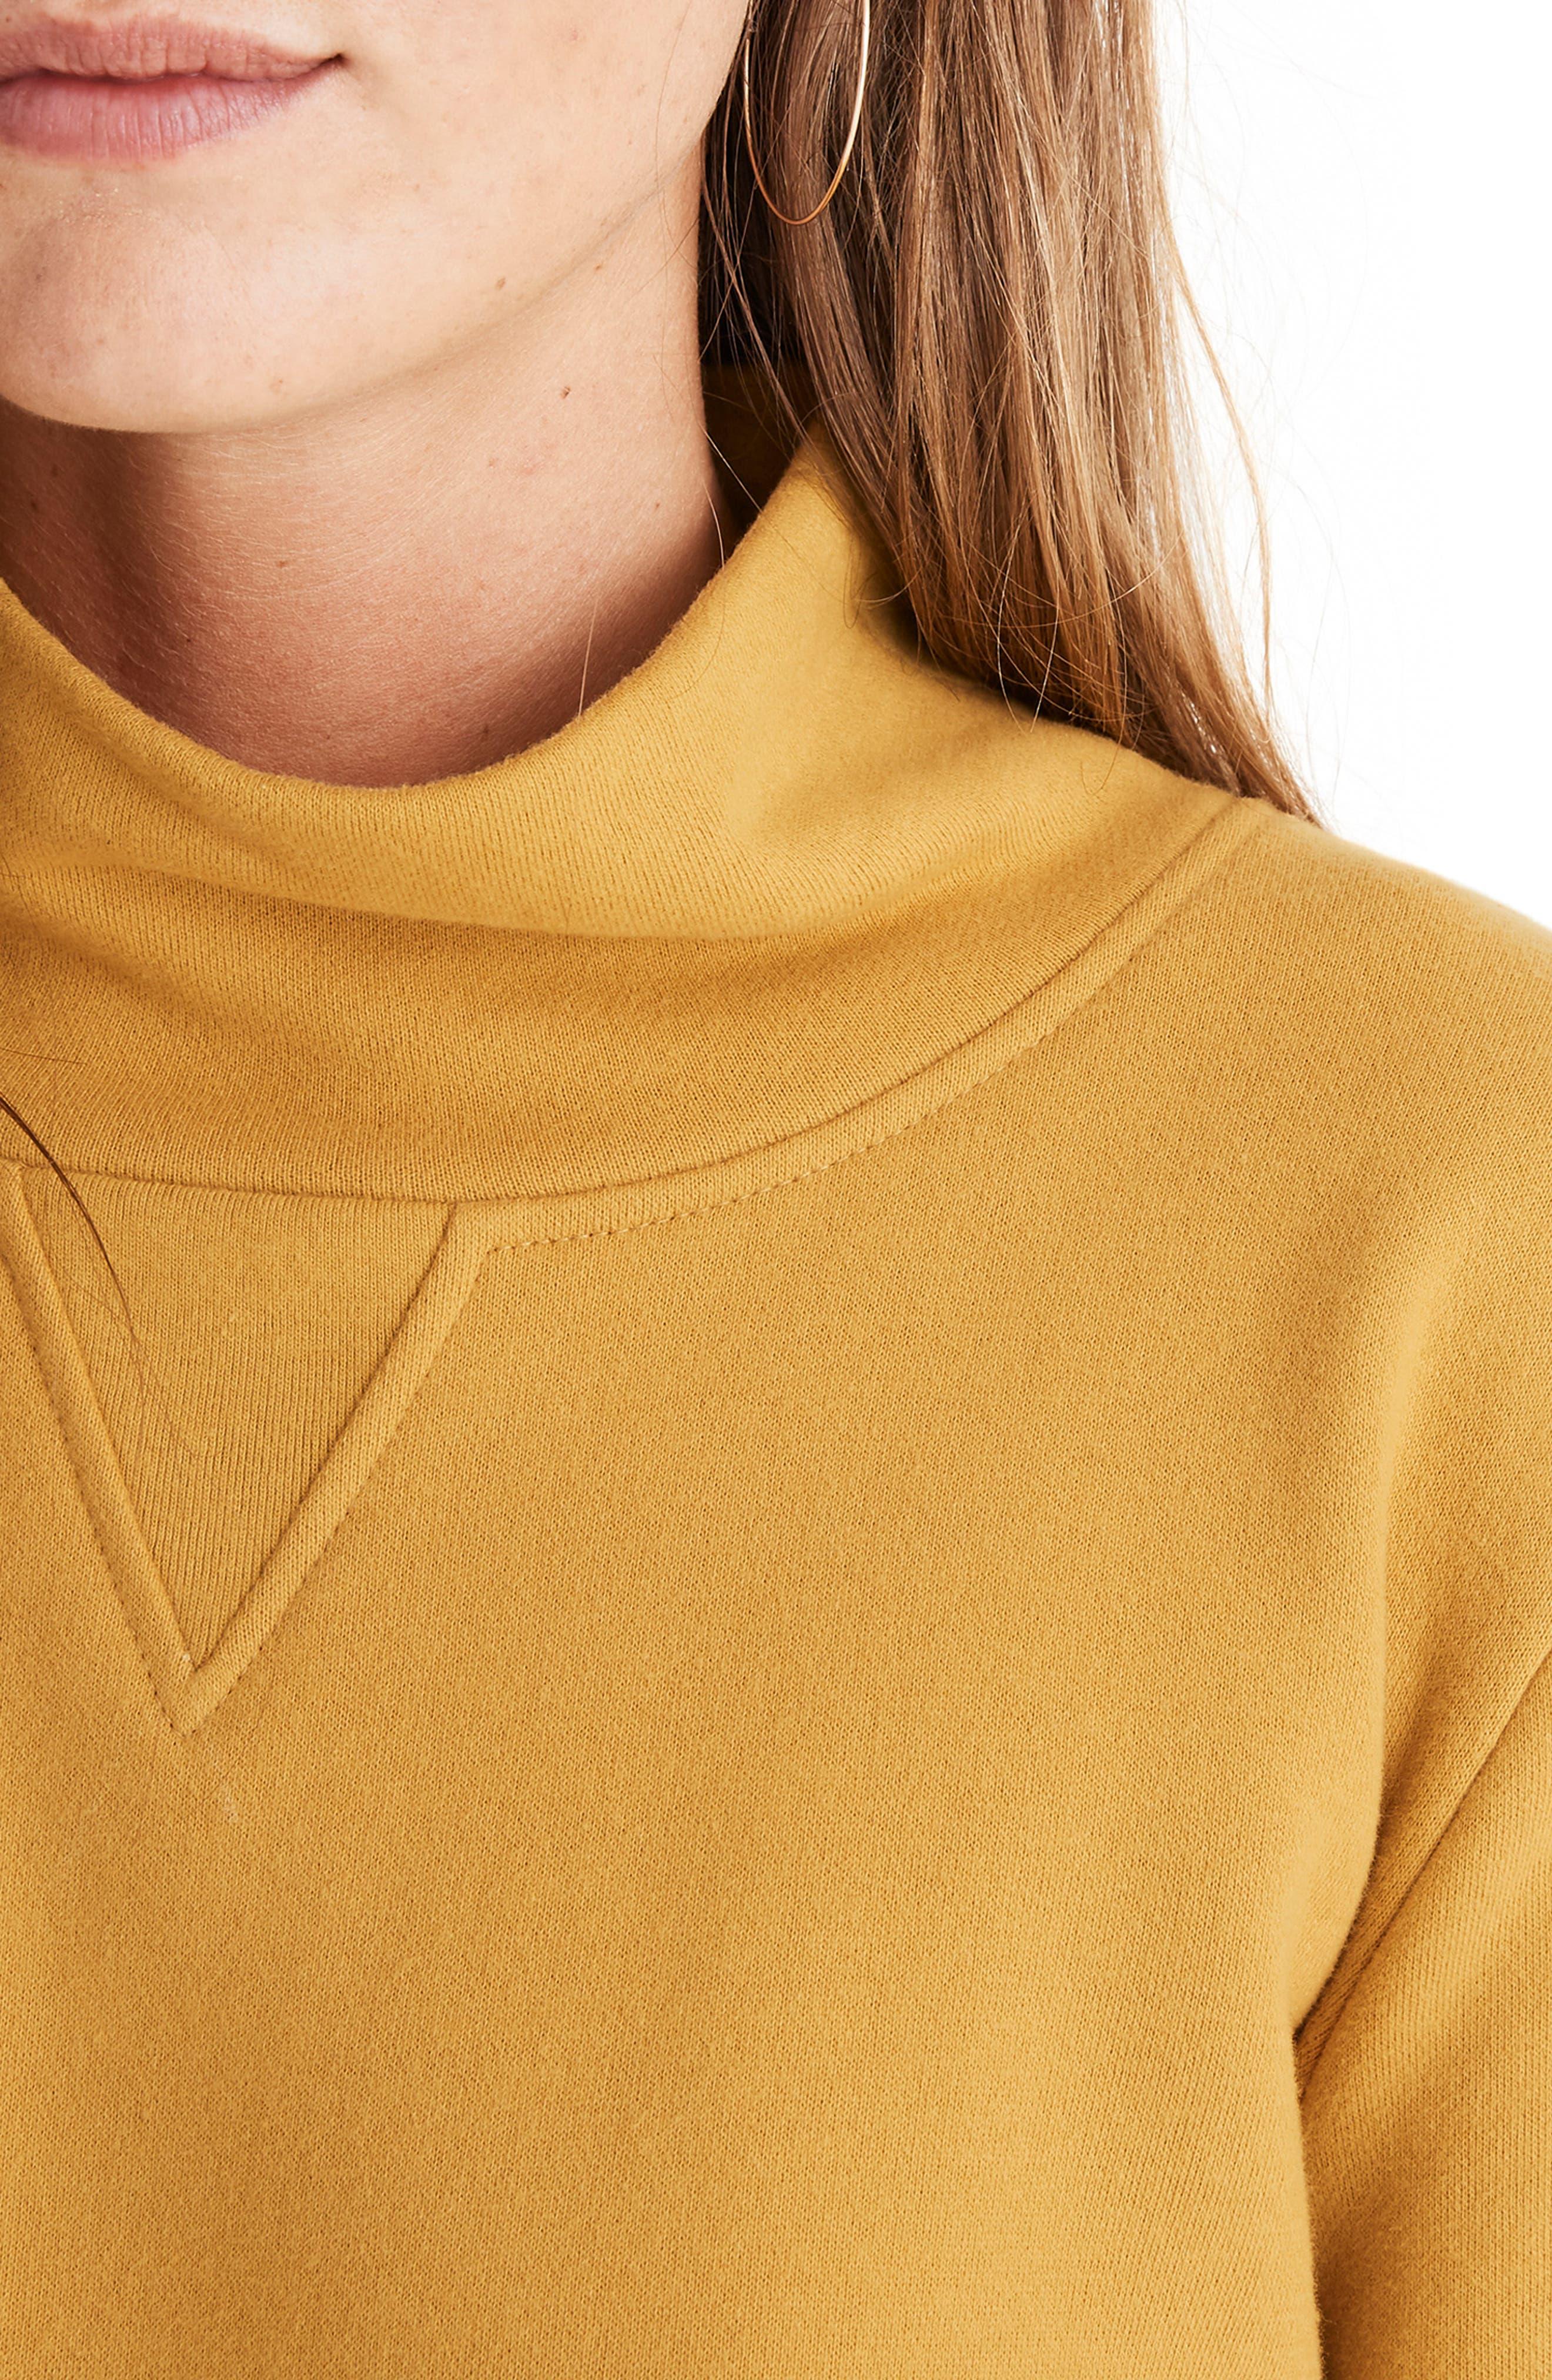 Turtleneck Sweatshirt,                             Alternate thumbnail 4, color,                             NECTAR GOLD